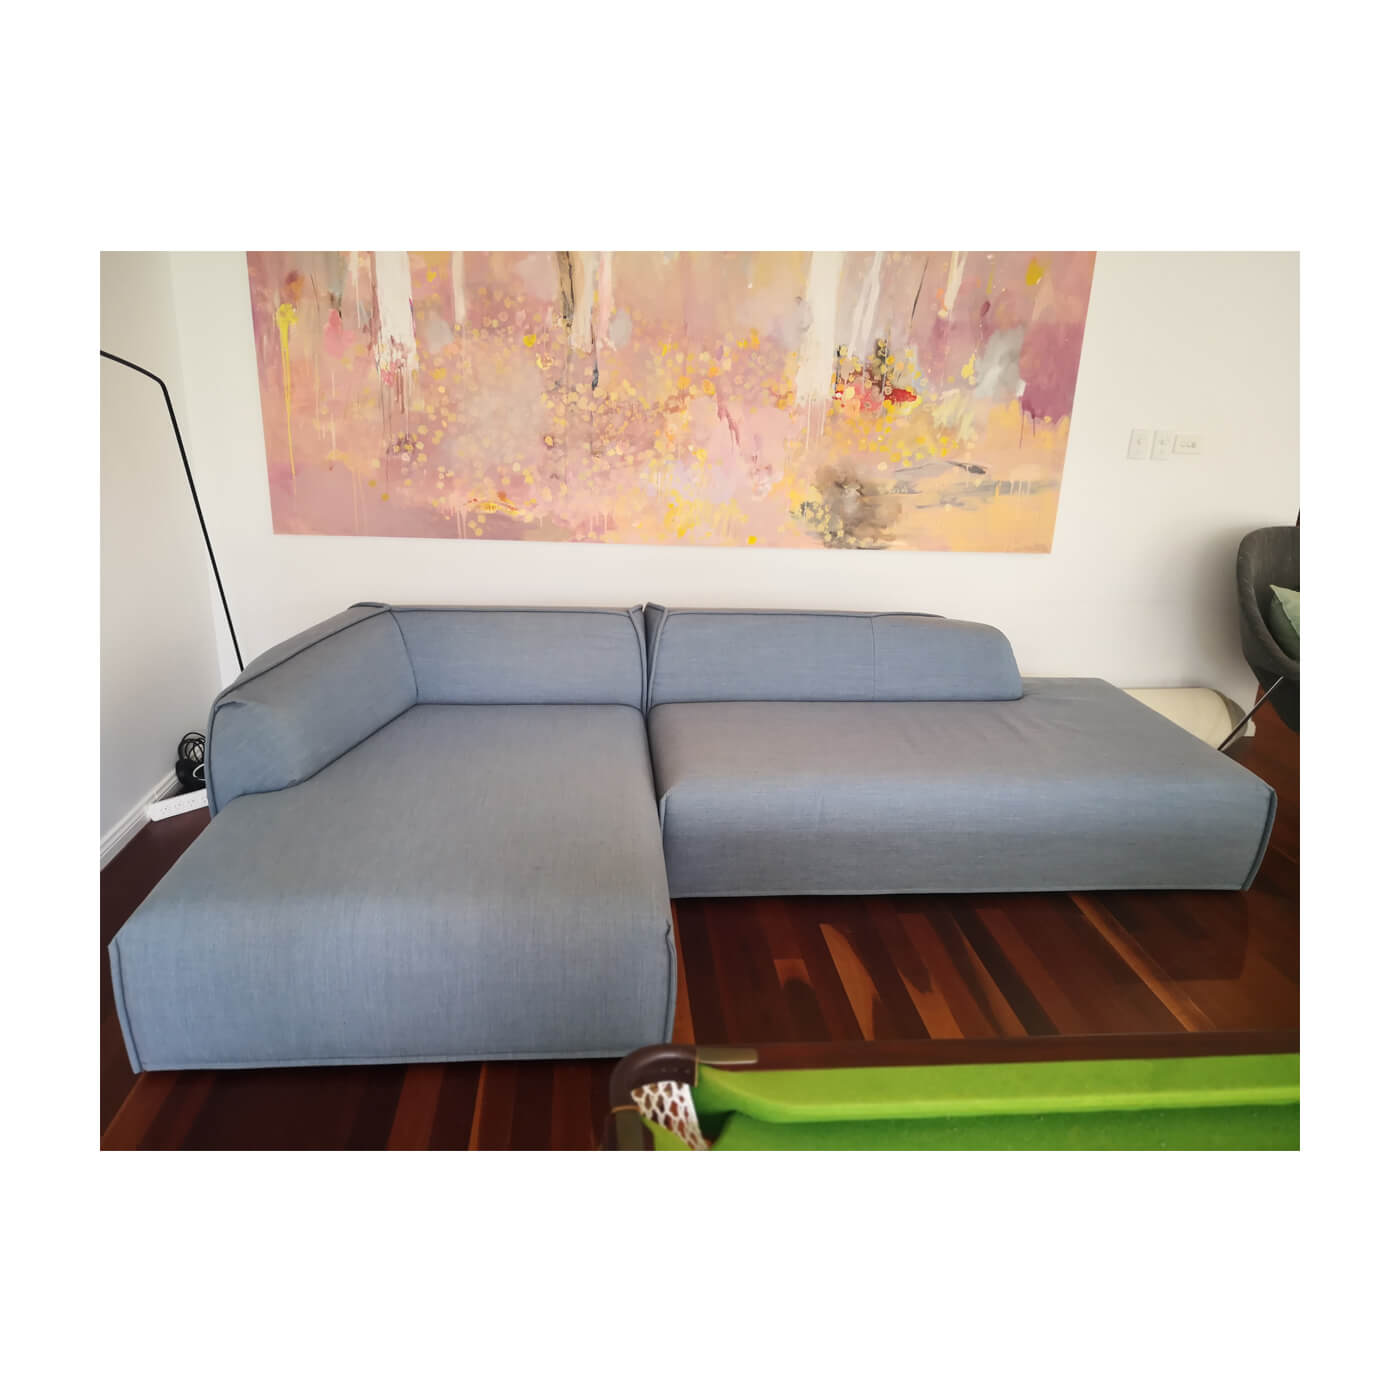 Moroso sofa by Patricia Urquiola